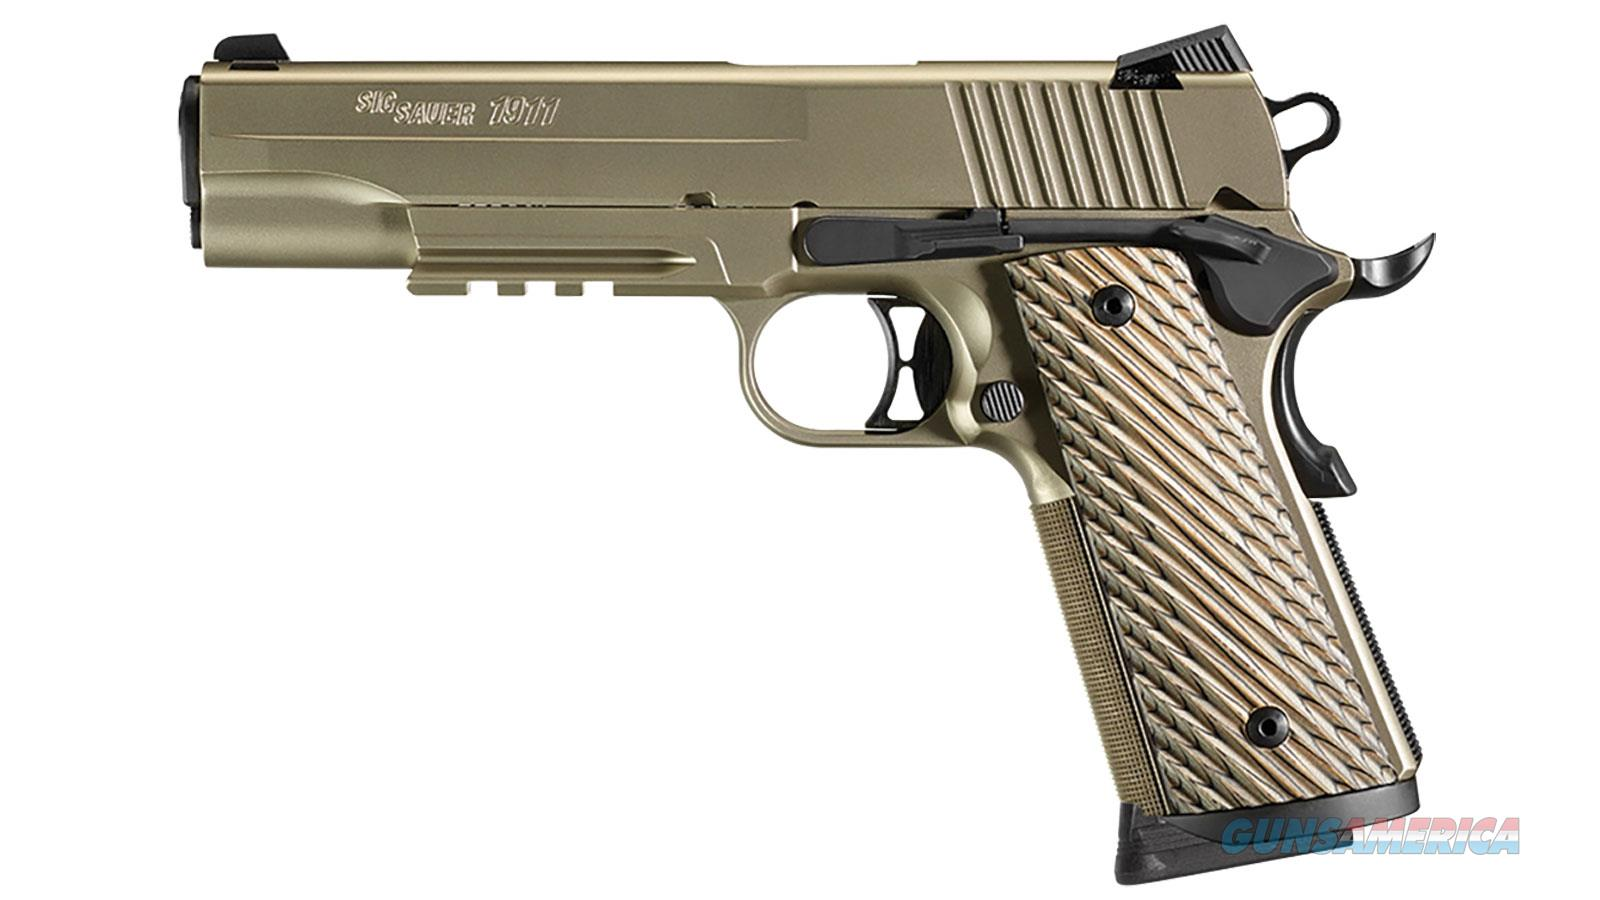 "Sig Sauer 1911R 45Acp 5"" 8Rd 1911R-45-NI  Guns > Pistols > S Misc Pistols"